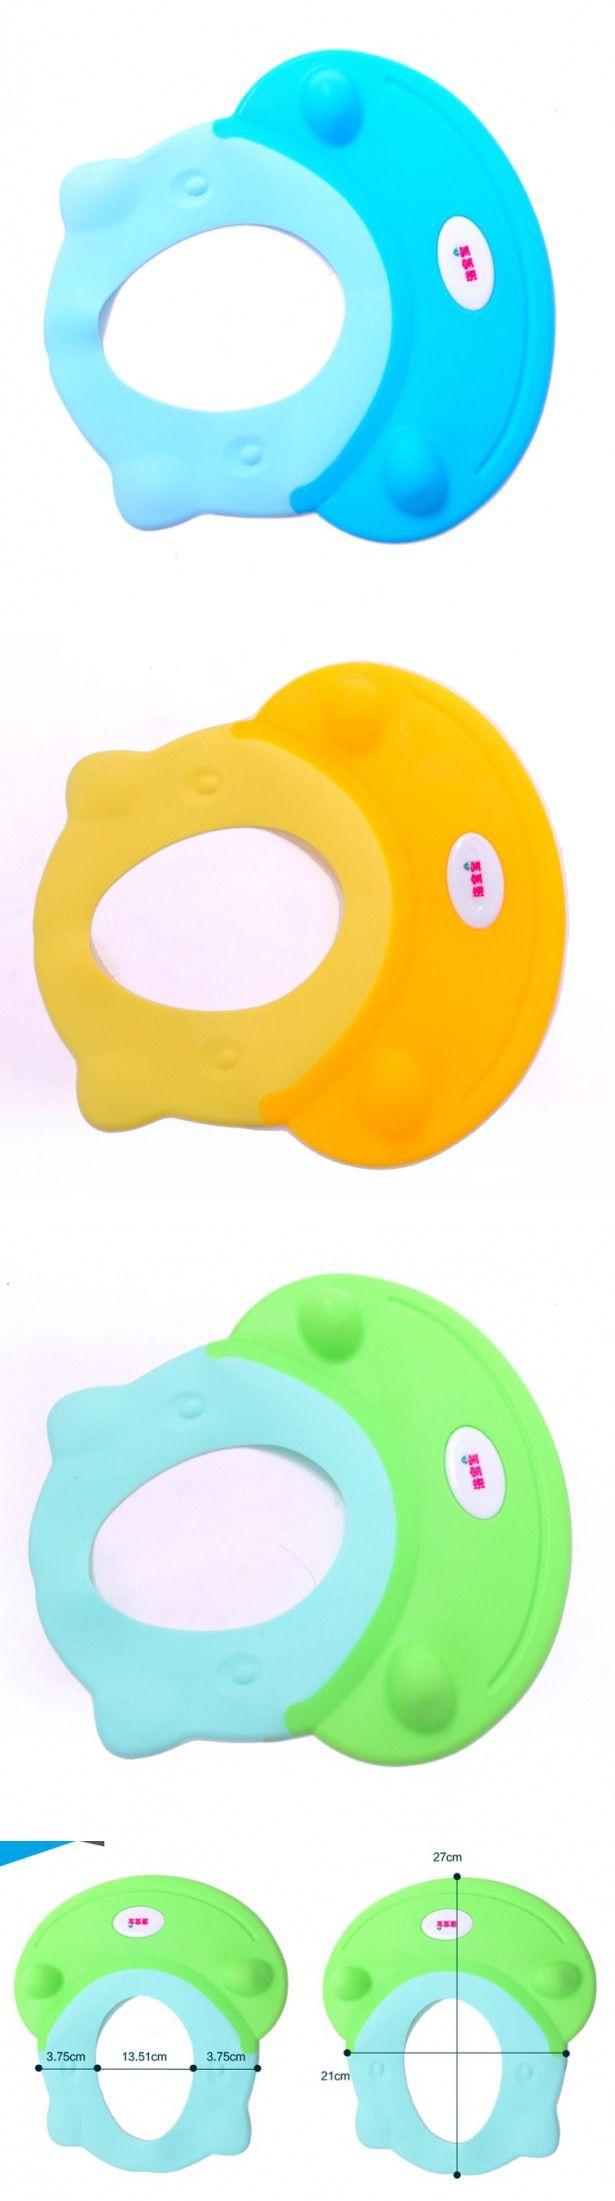 New kids shampoo cap Baby care Shampoo hats Kids washing hats Fashion design silicon shampoo caps